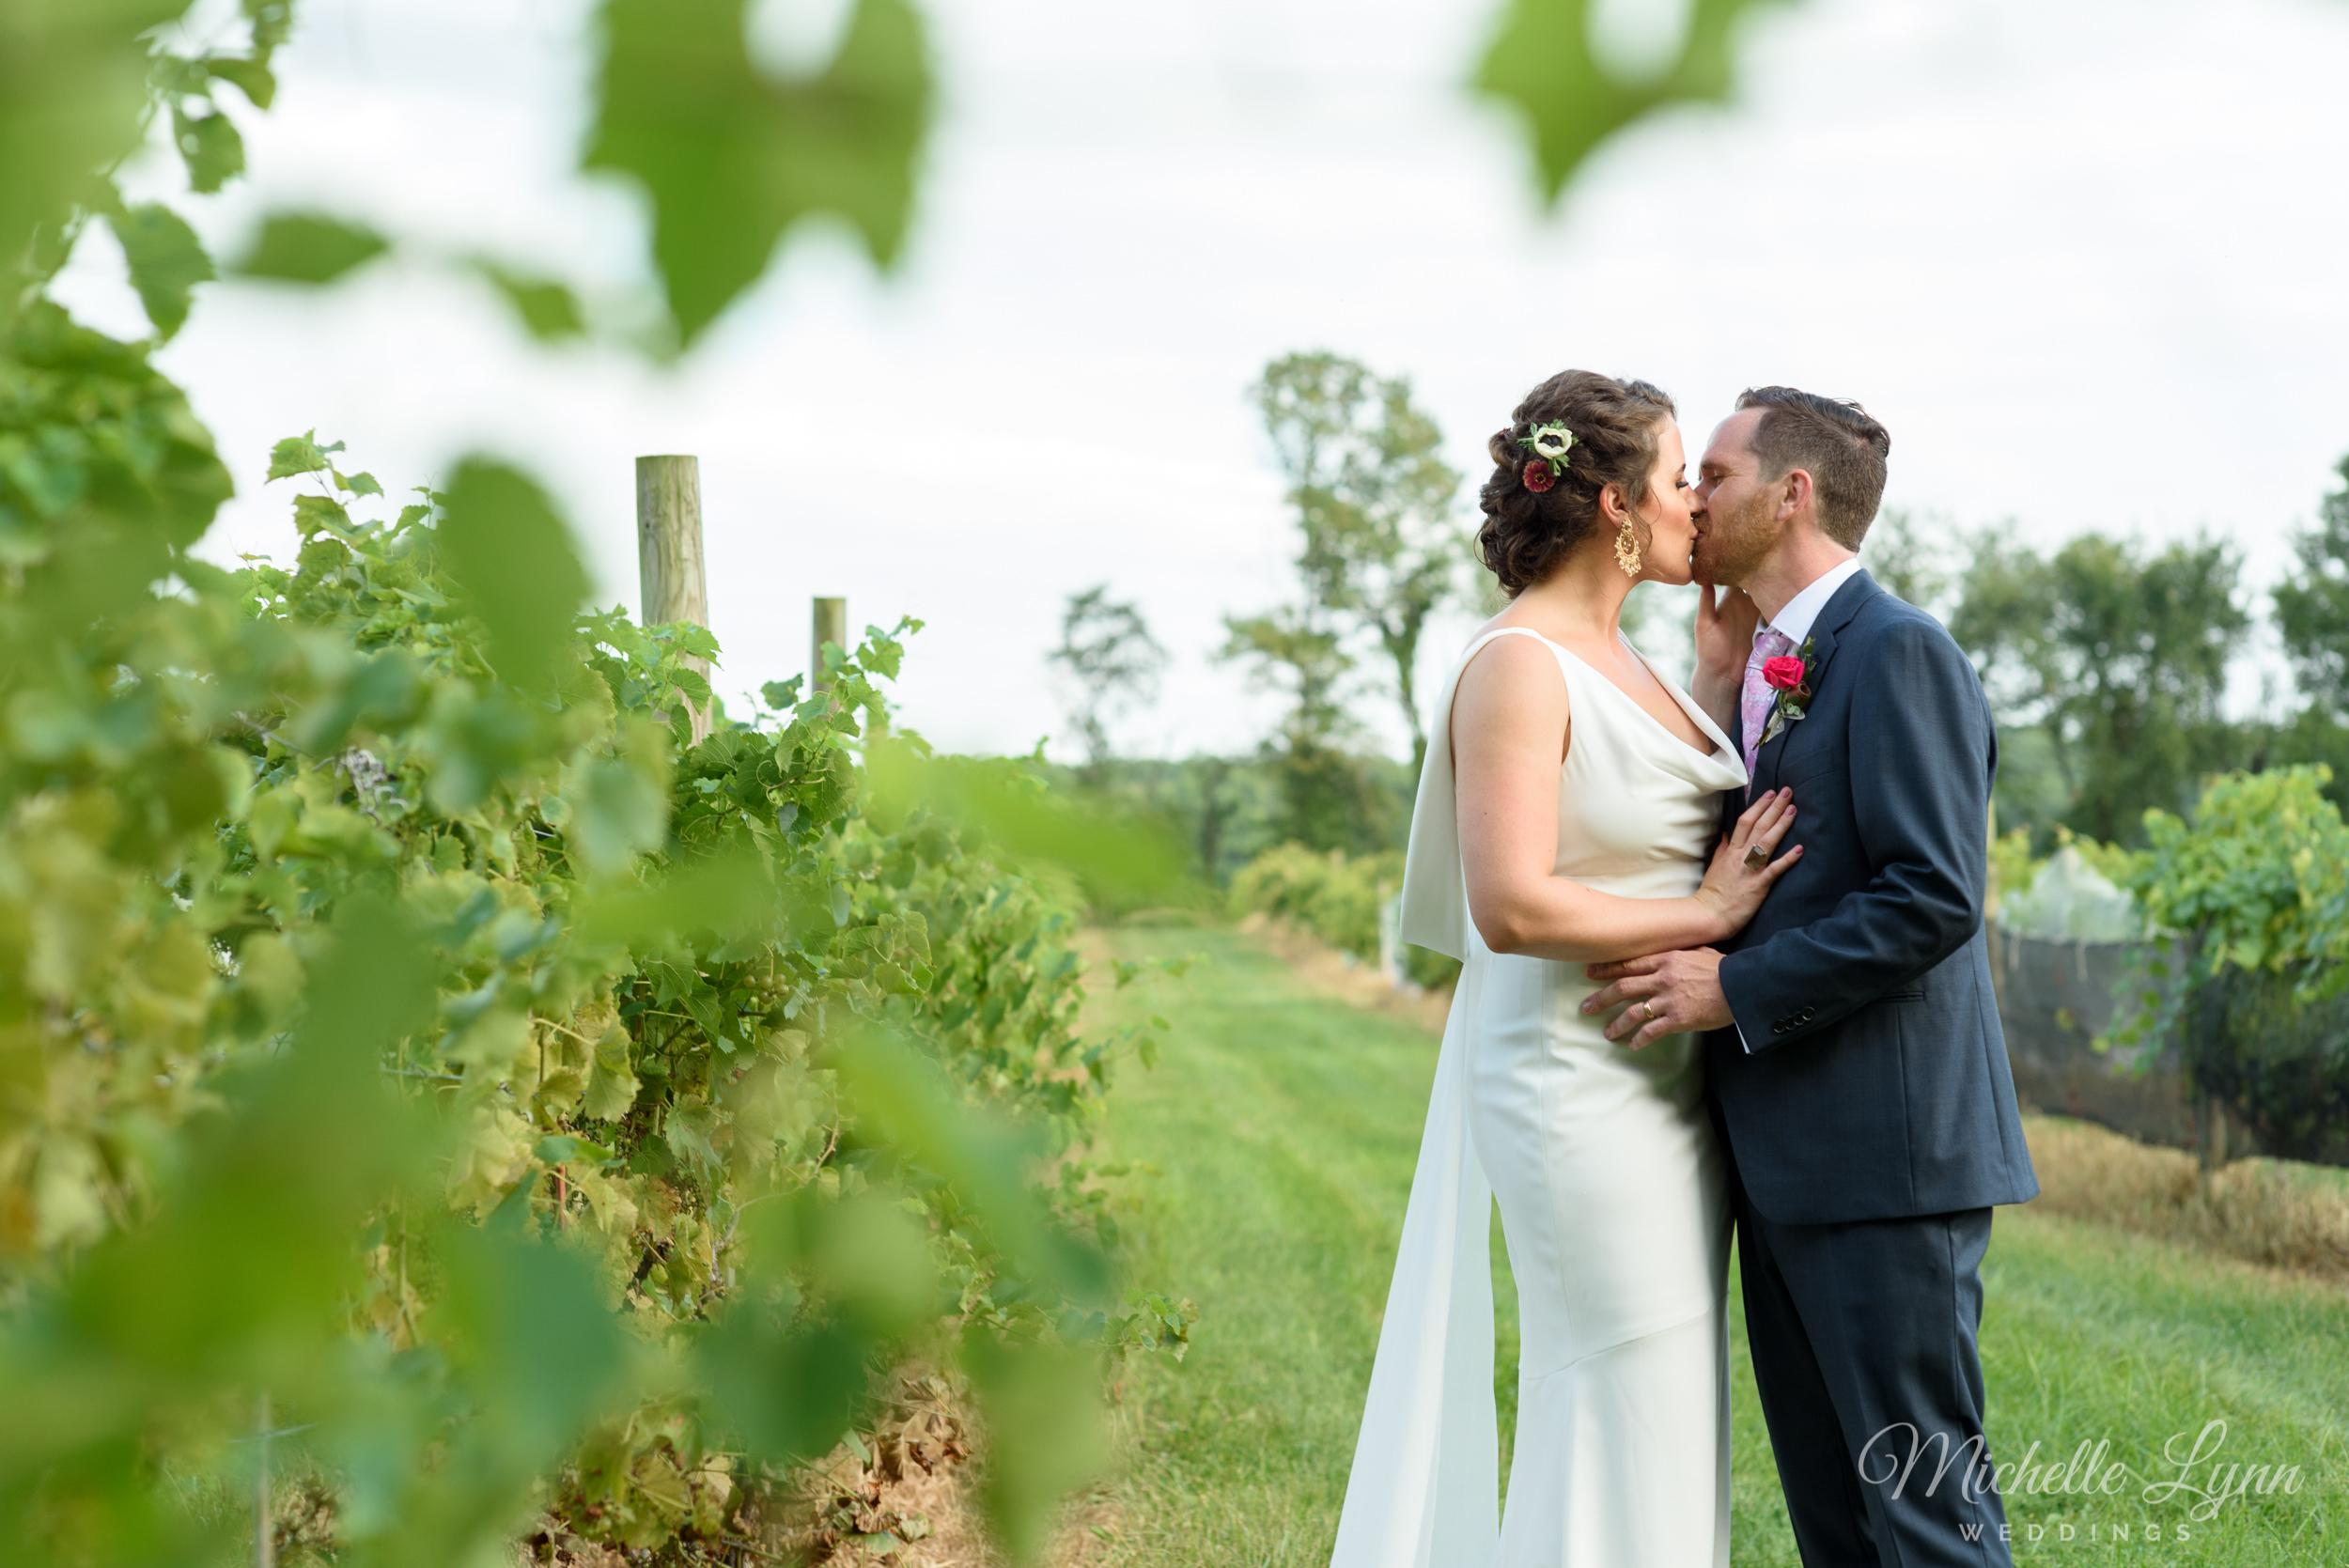 mlw-unionville-vineyards-nj-wedding-photography-62.jpg